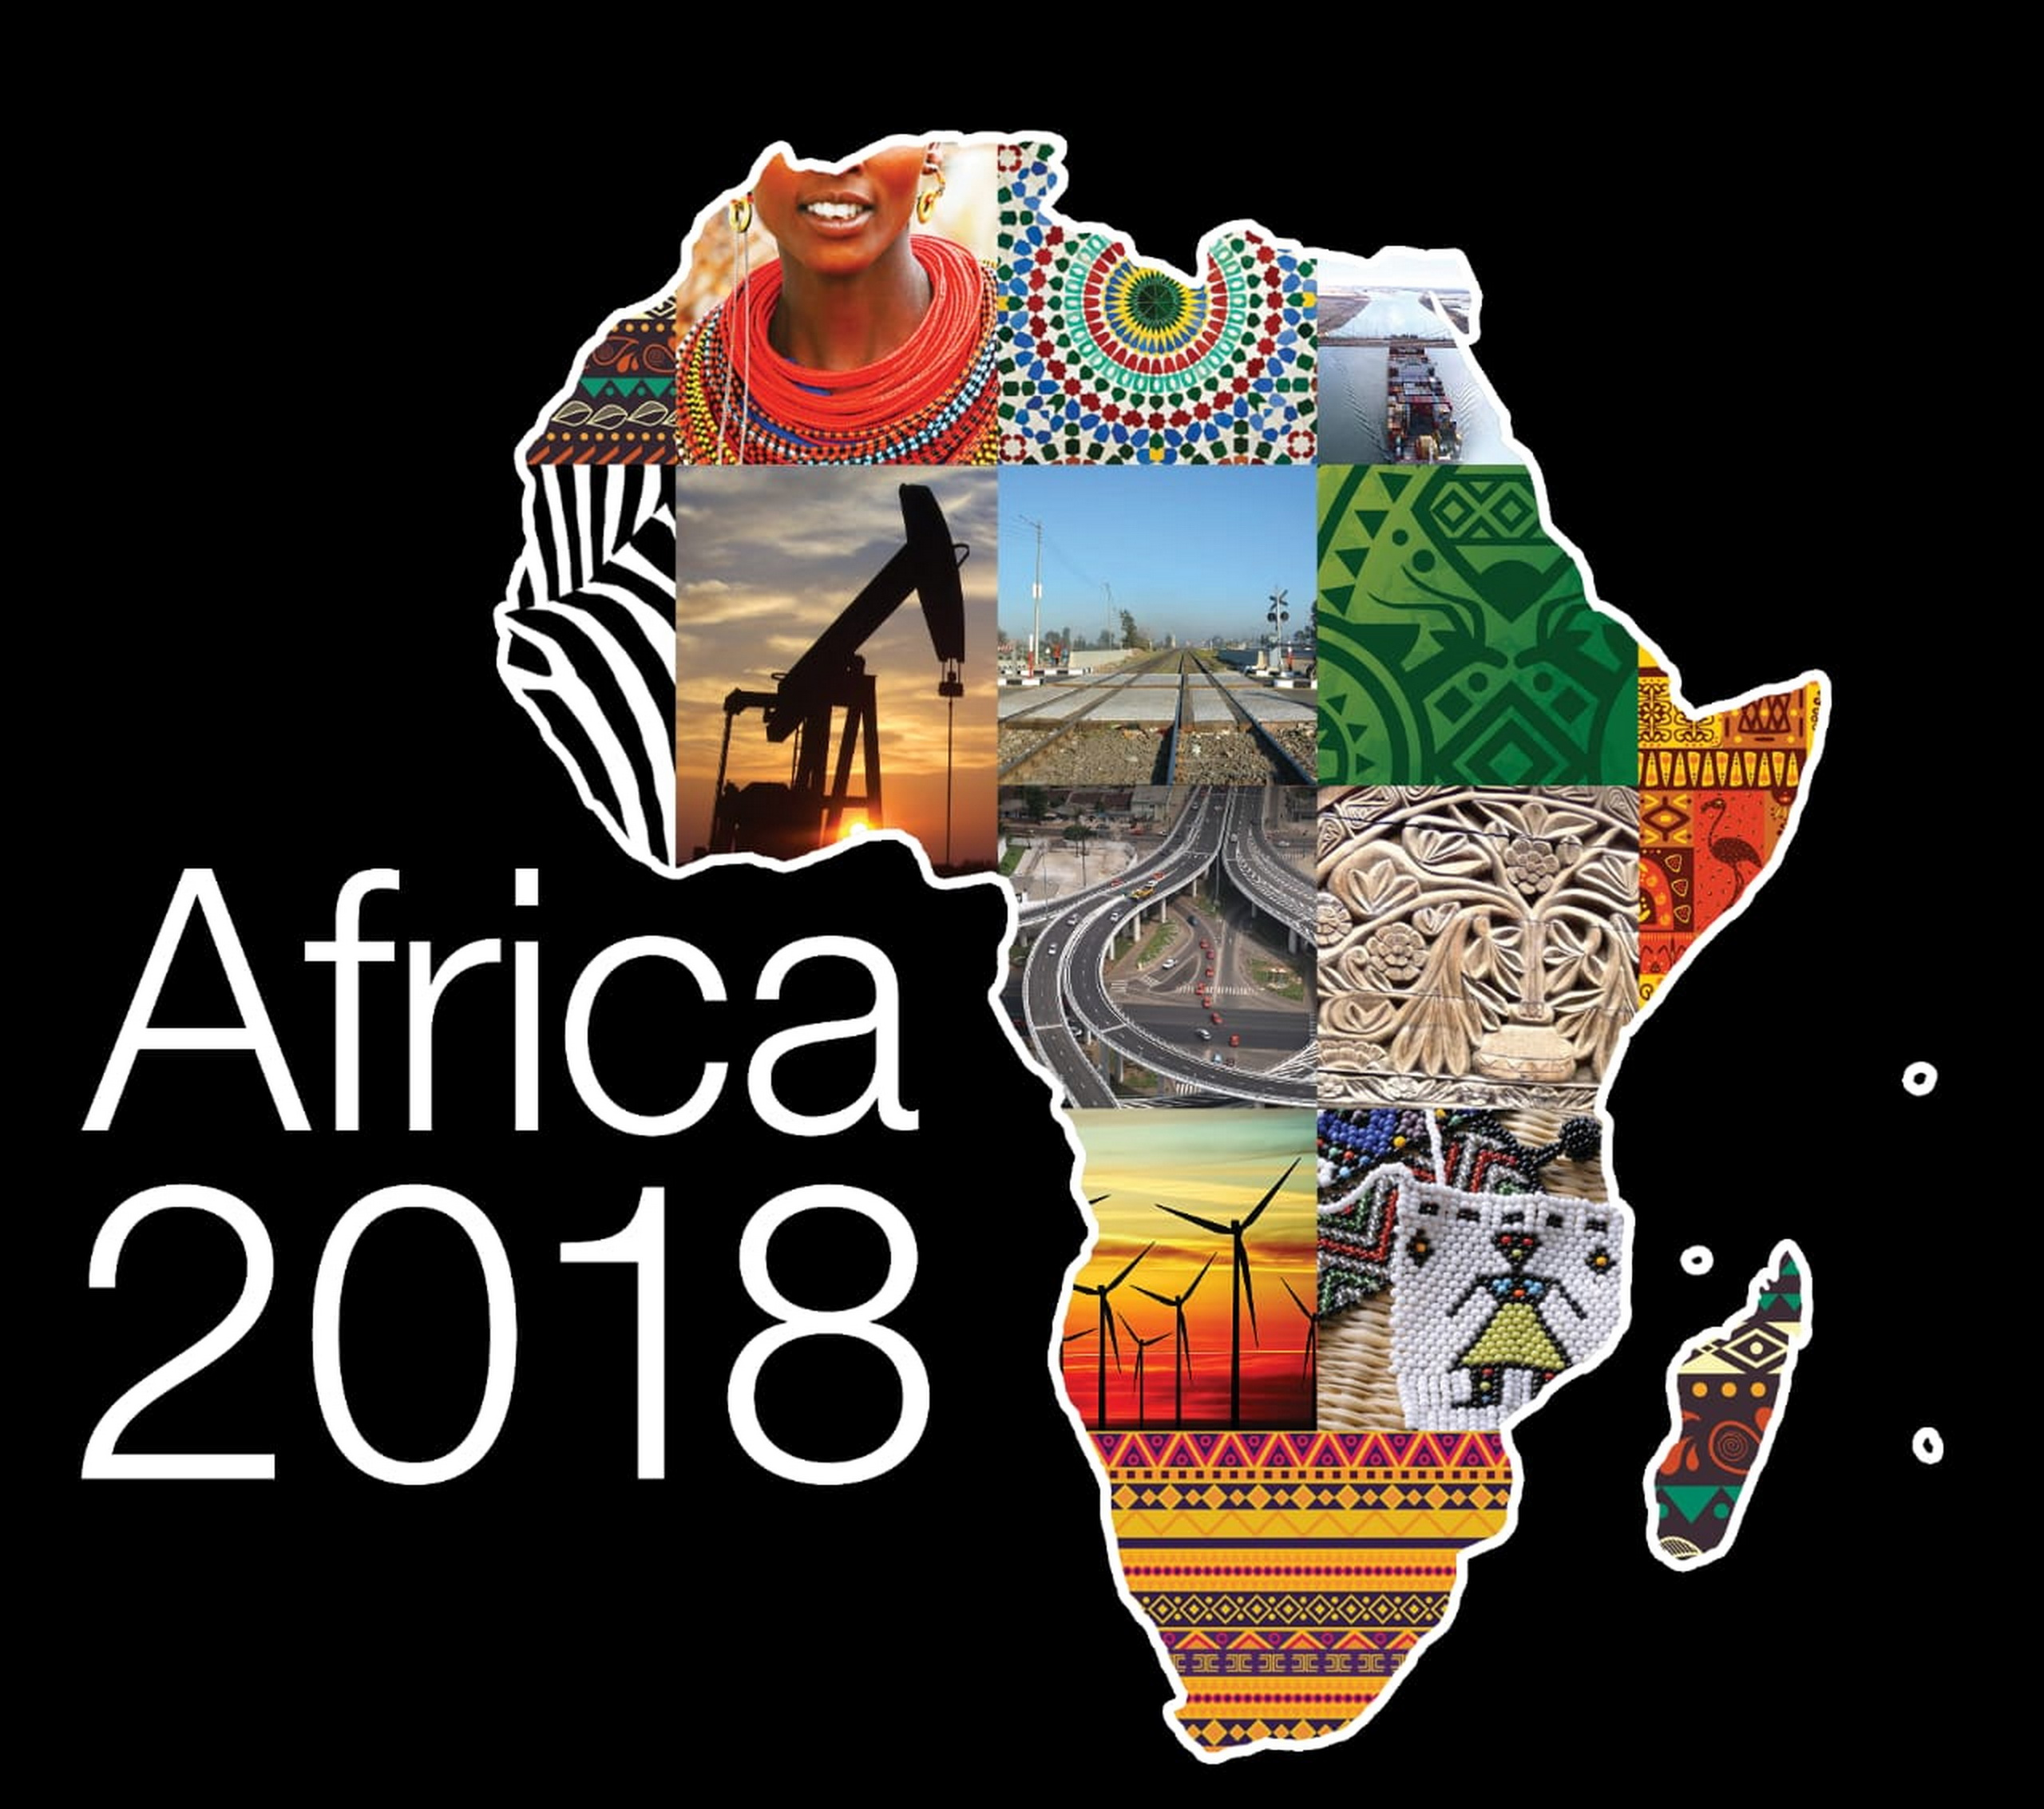 Africa Forum 2018 Logo 1